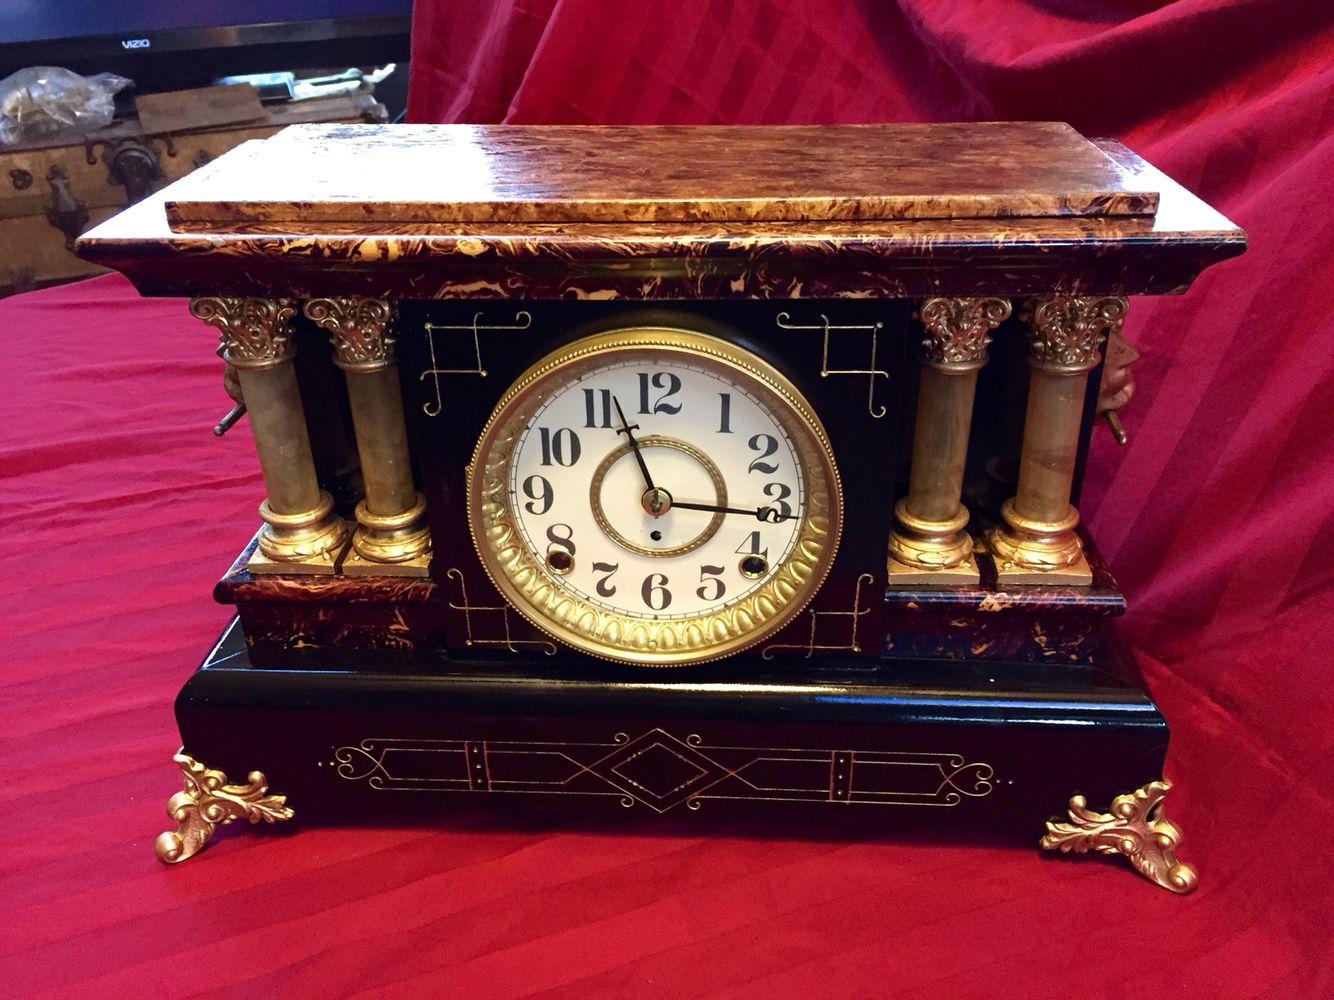 Seth Thomas Antique Mantle Clock Sold On Ebay 100 Years Old Antique Mantle Clock Mantle Clock Clock